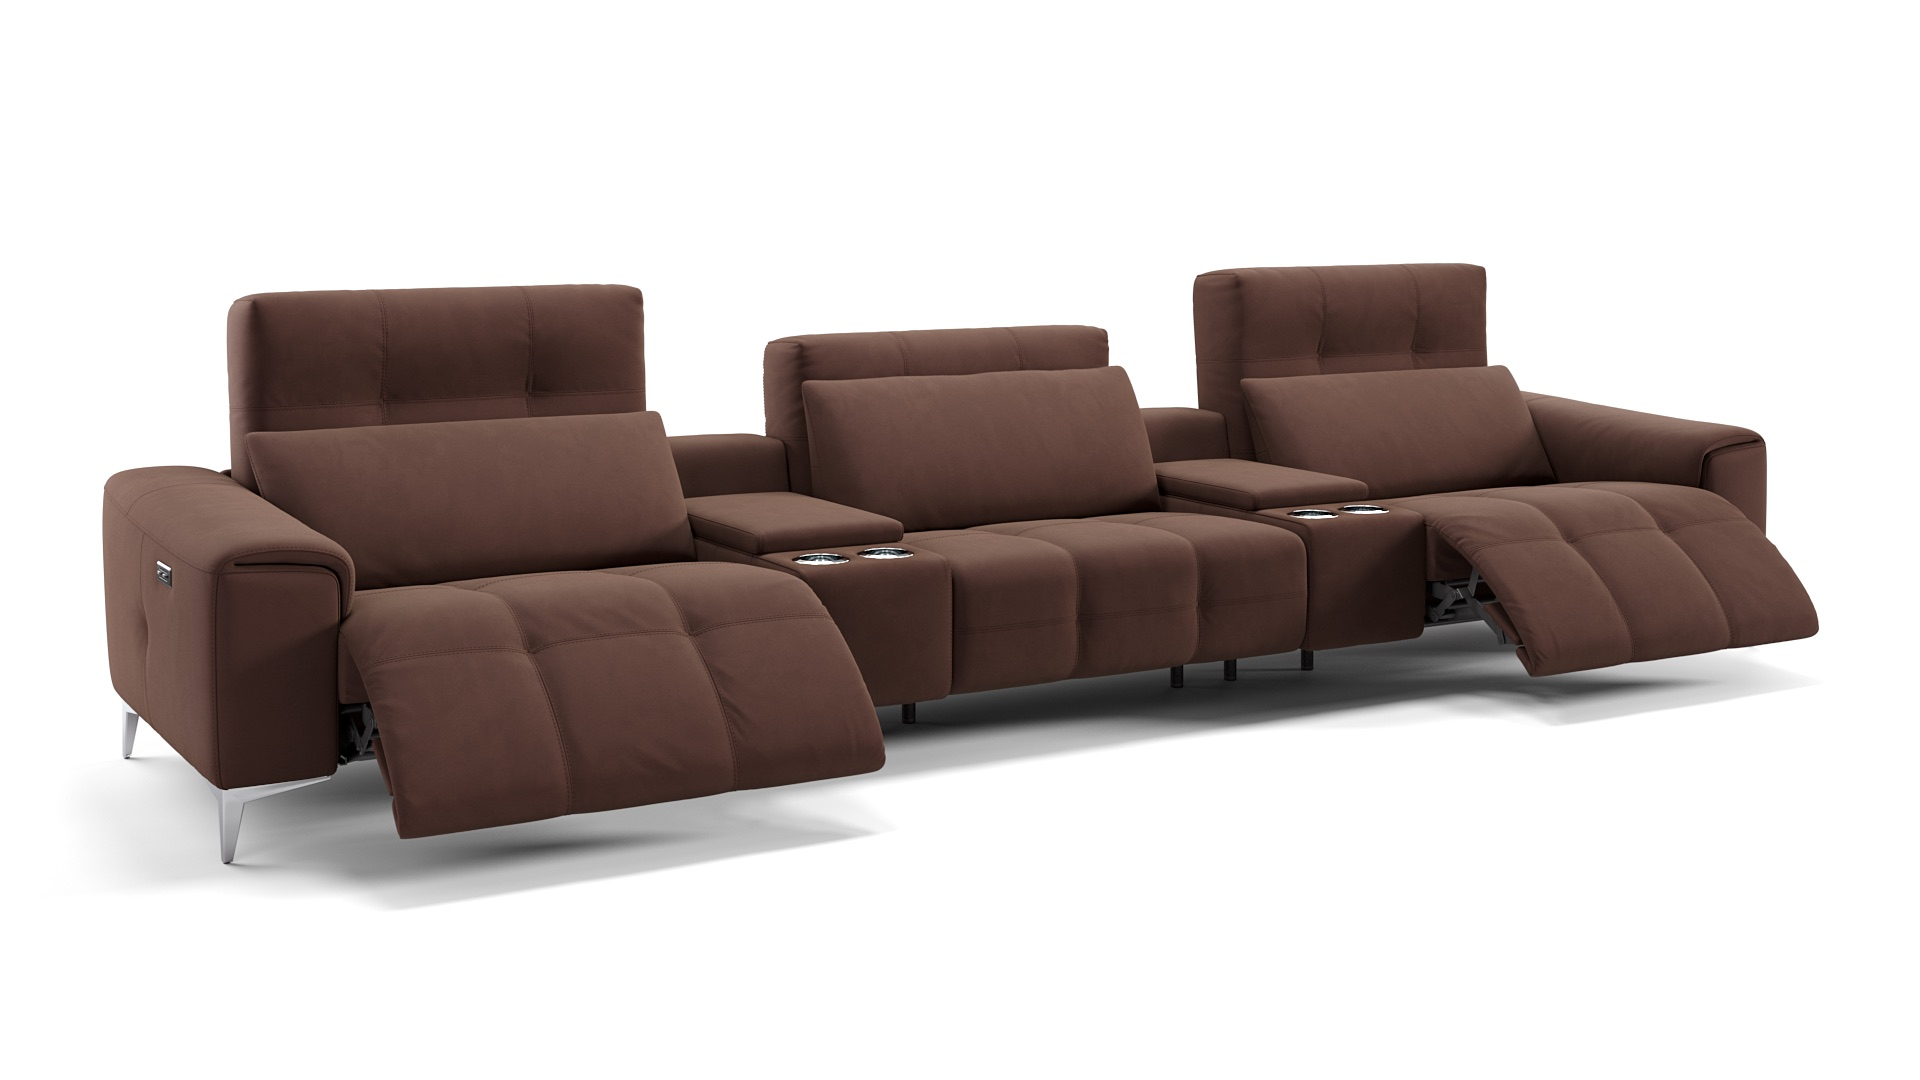 Stoff 3-Sitzer Kinosofa SALENTO